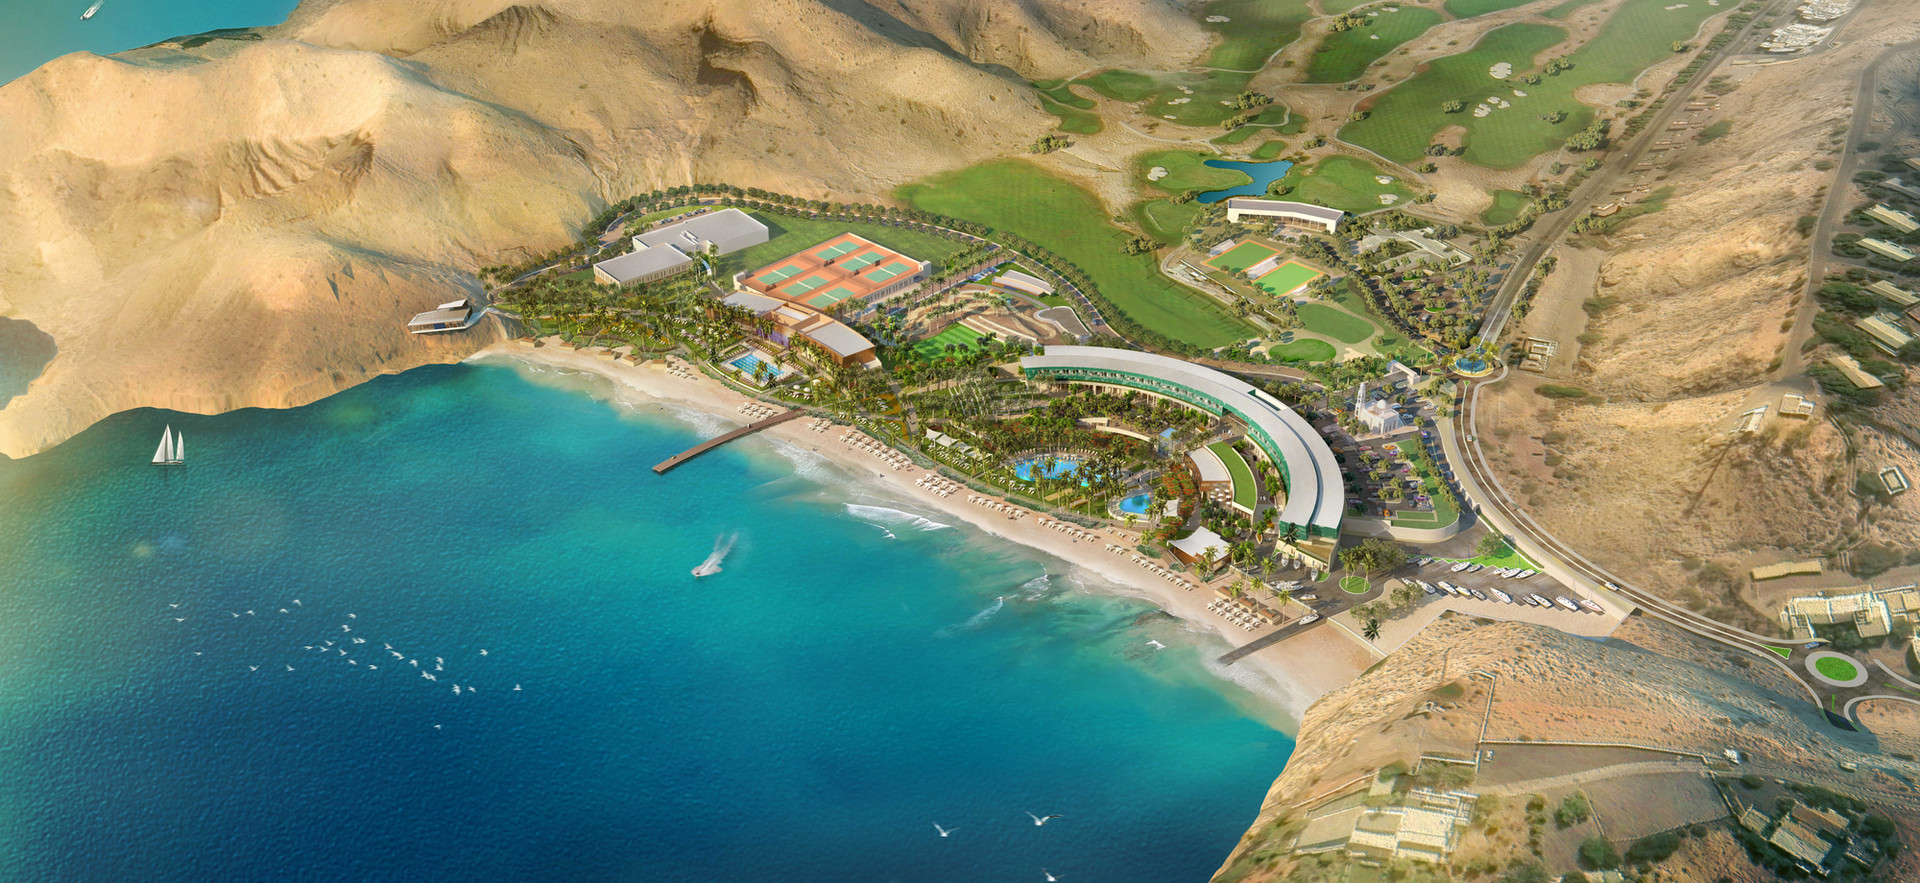 Recreation Club, Ras Al Hamra, Oman